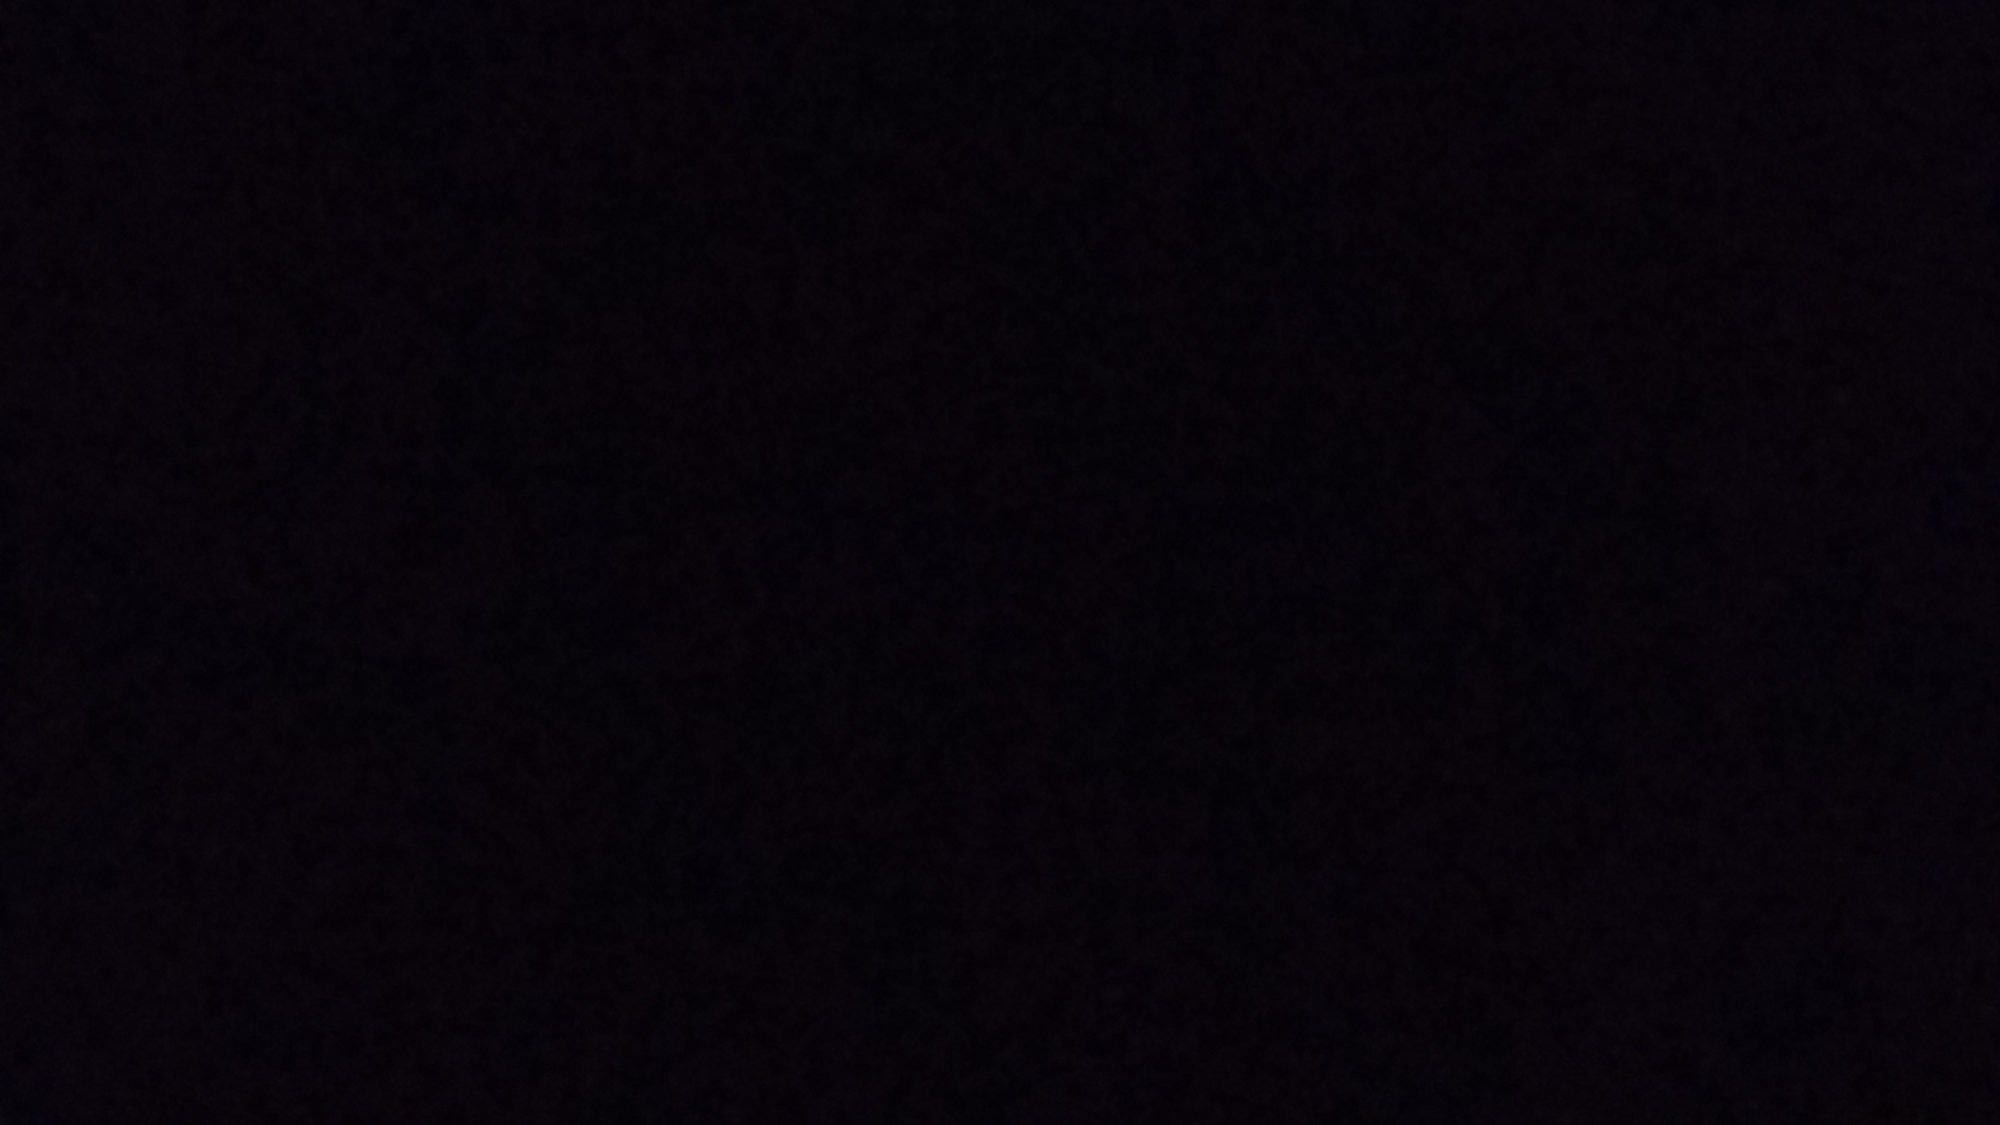 xXBrandonGarciaRamselXx's Cover Photo